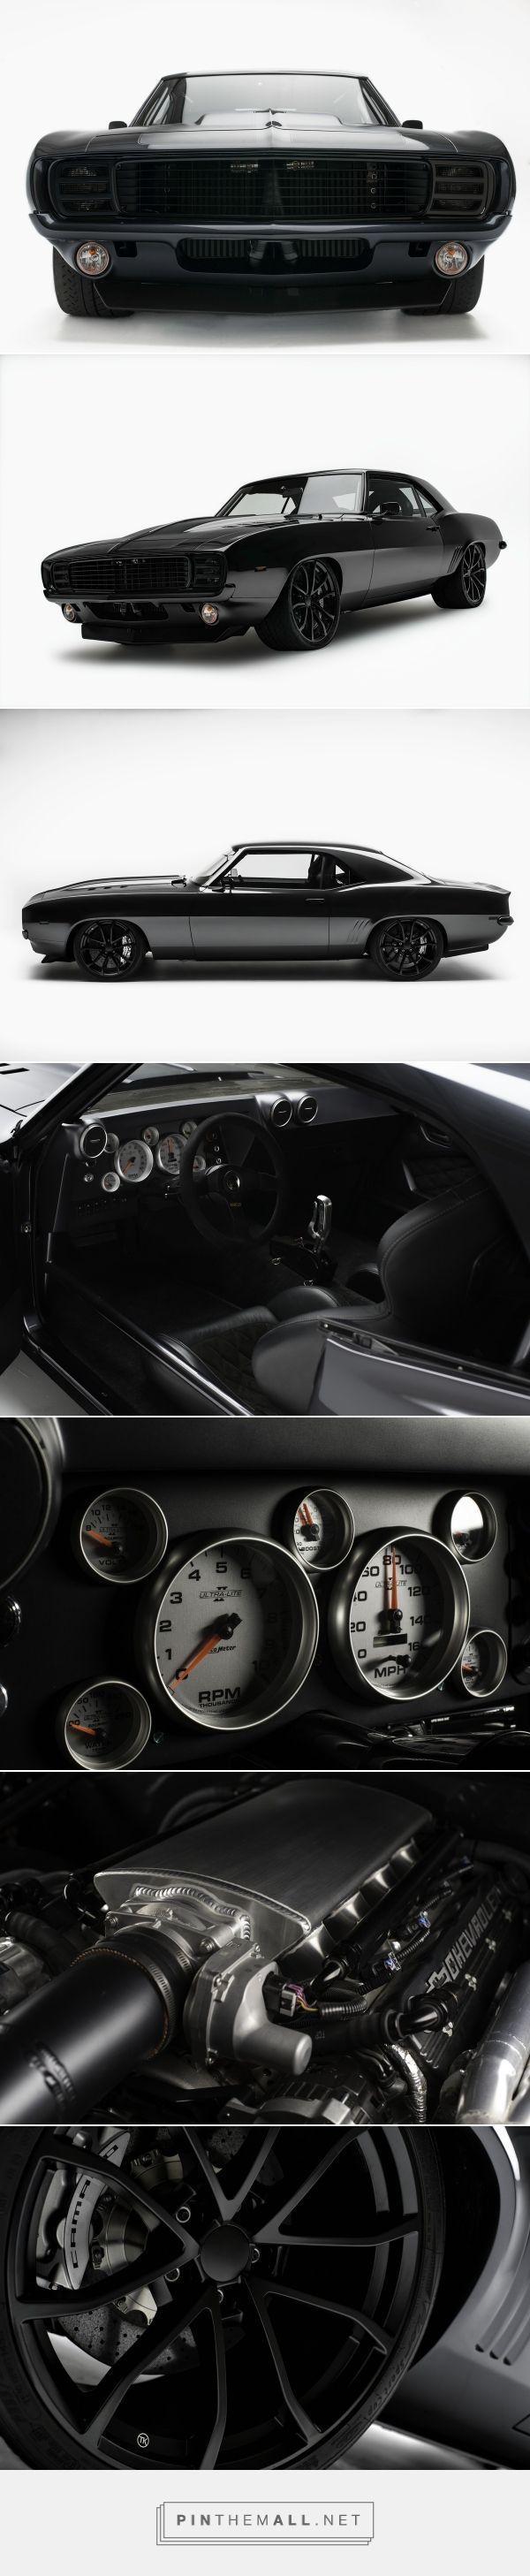 Blacked-Out 1969 Chevrolet Camaro  #blacked #camaro #chevrolet,    Source link #BlackedOut #Camaro #Chevrolet